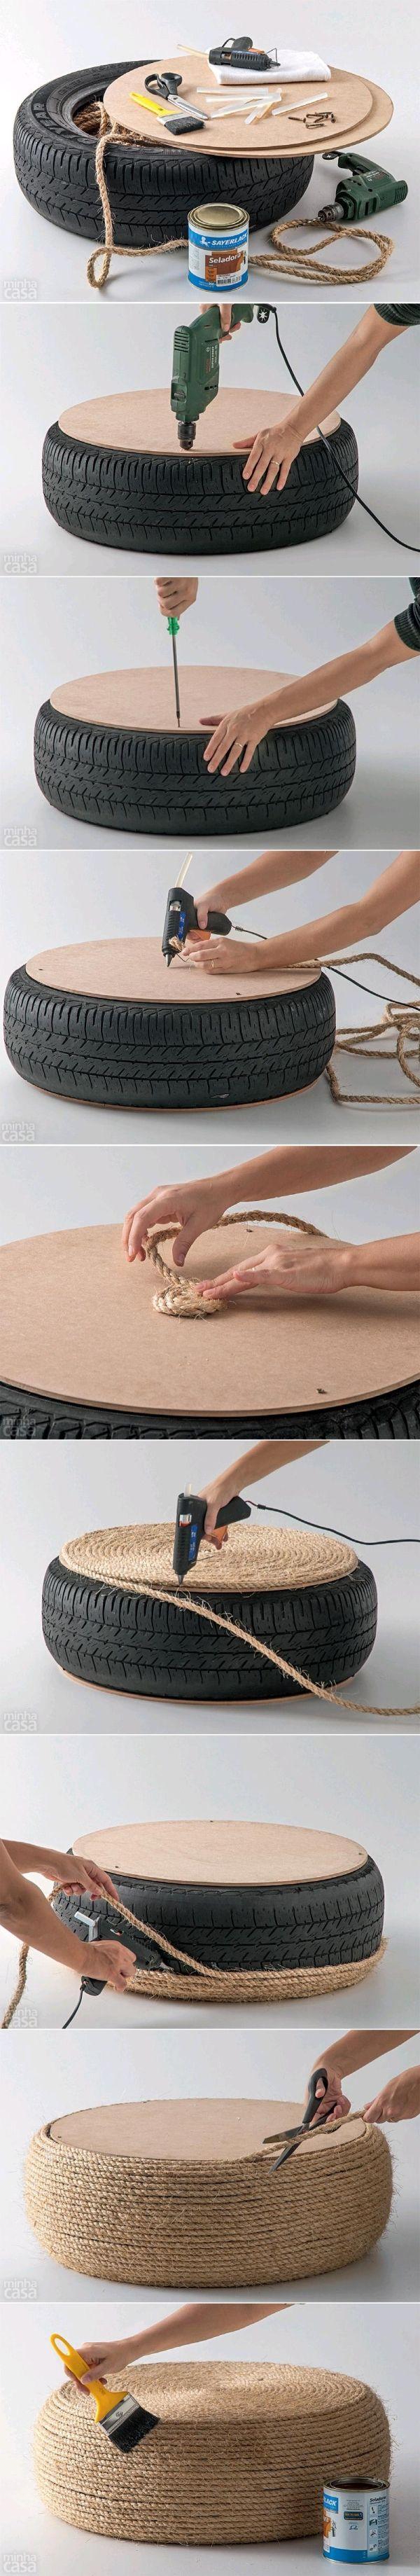 DIY Tire Ottoman DIY Tire Ottoman by diyforever